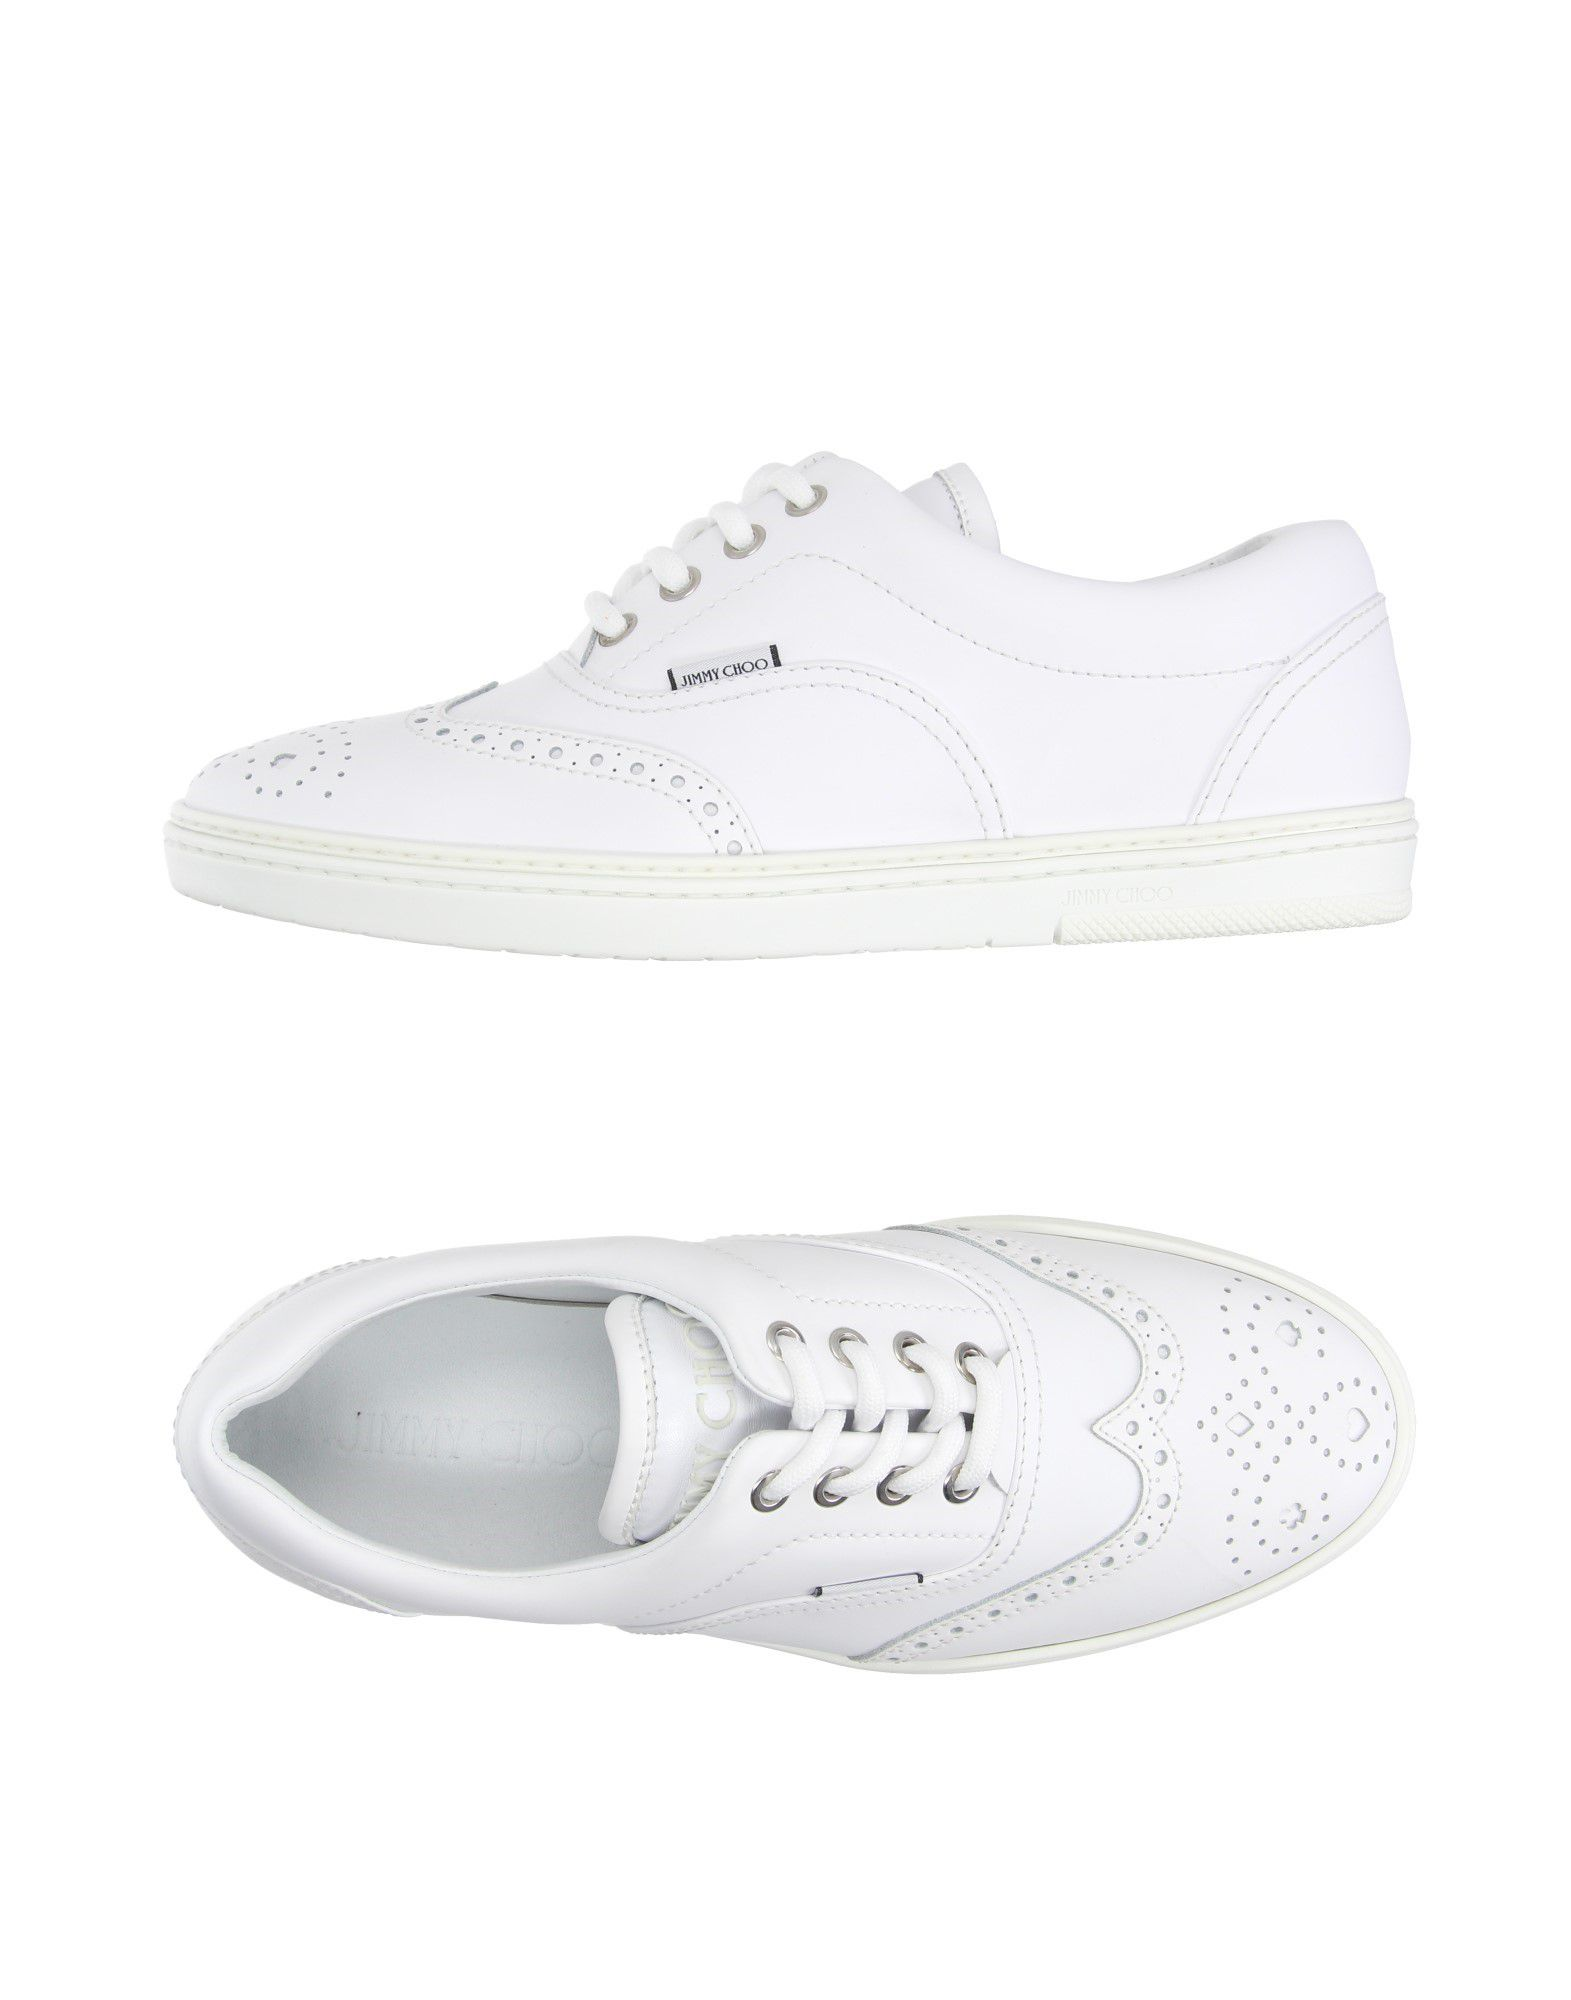 Jimmy Choo Sneakers Herren  11142433PC Gute Qualität beliebte Schuhe